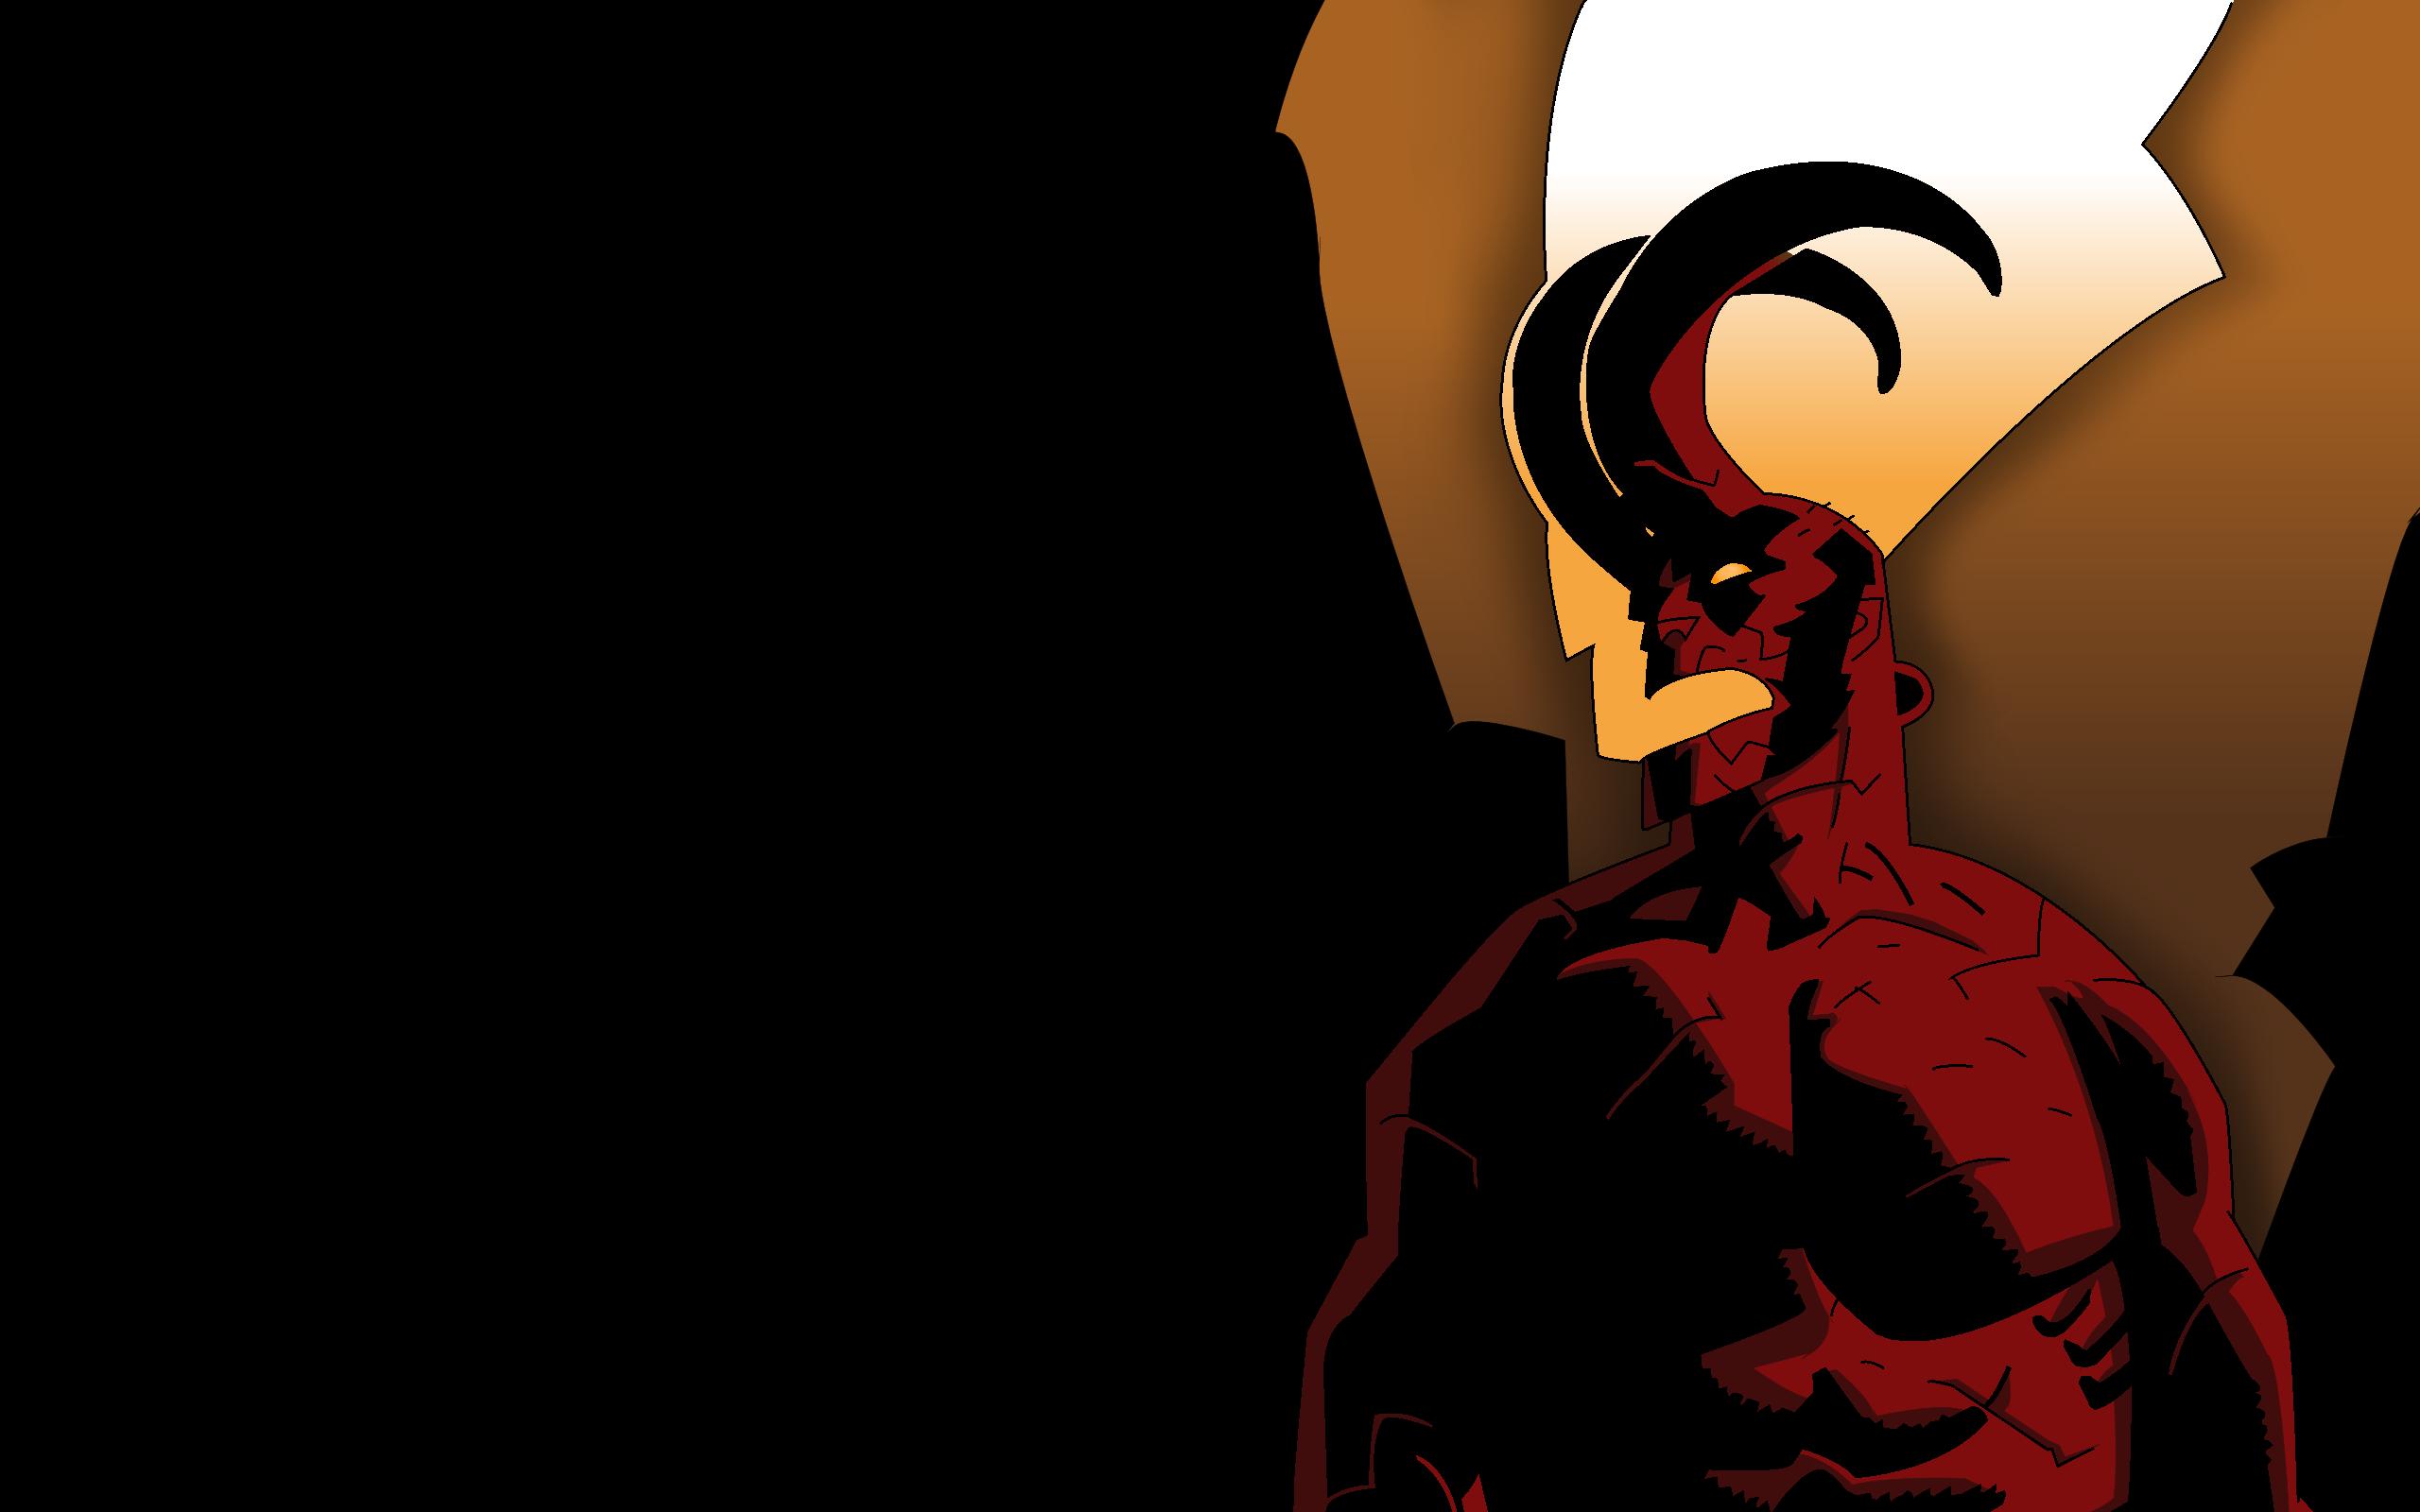 wake the devil hellboy wallpaper by cameronart on deviantart